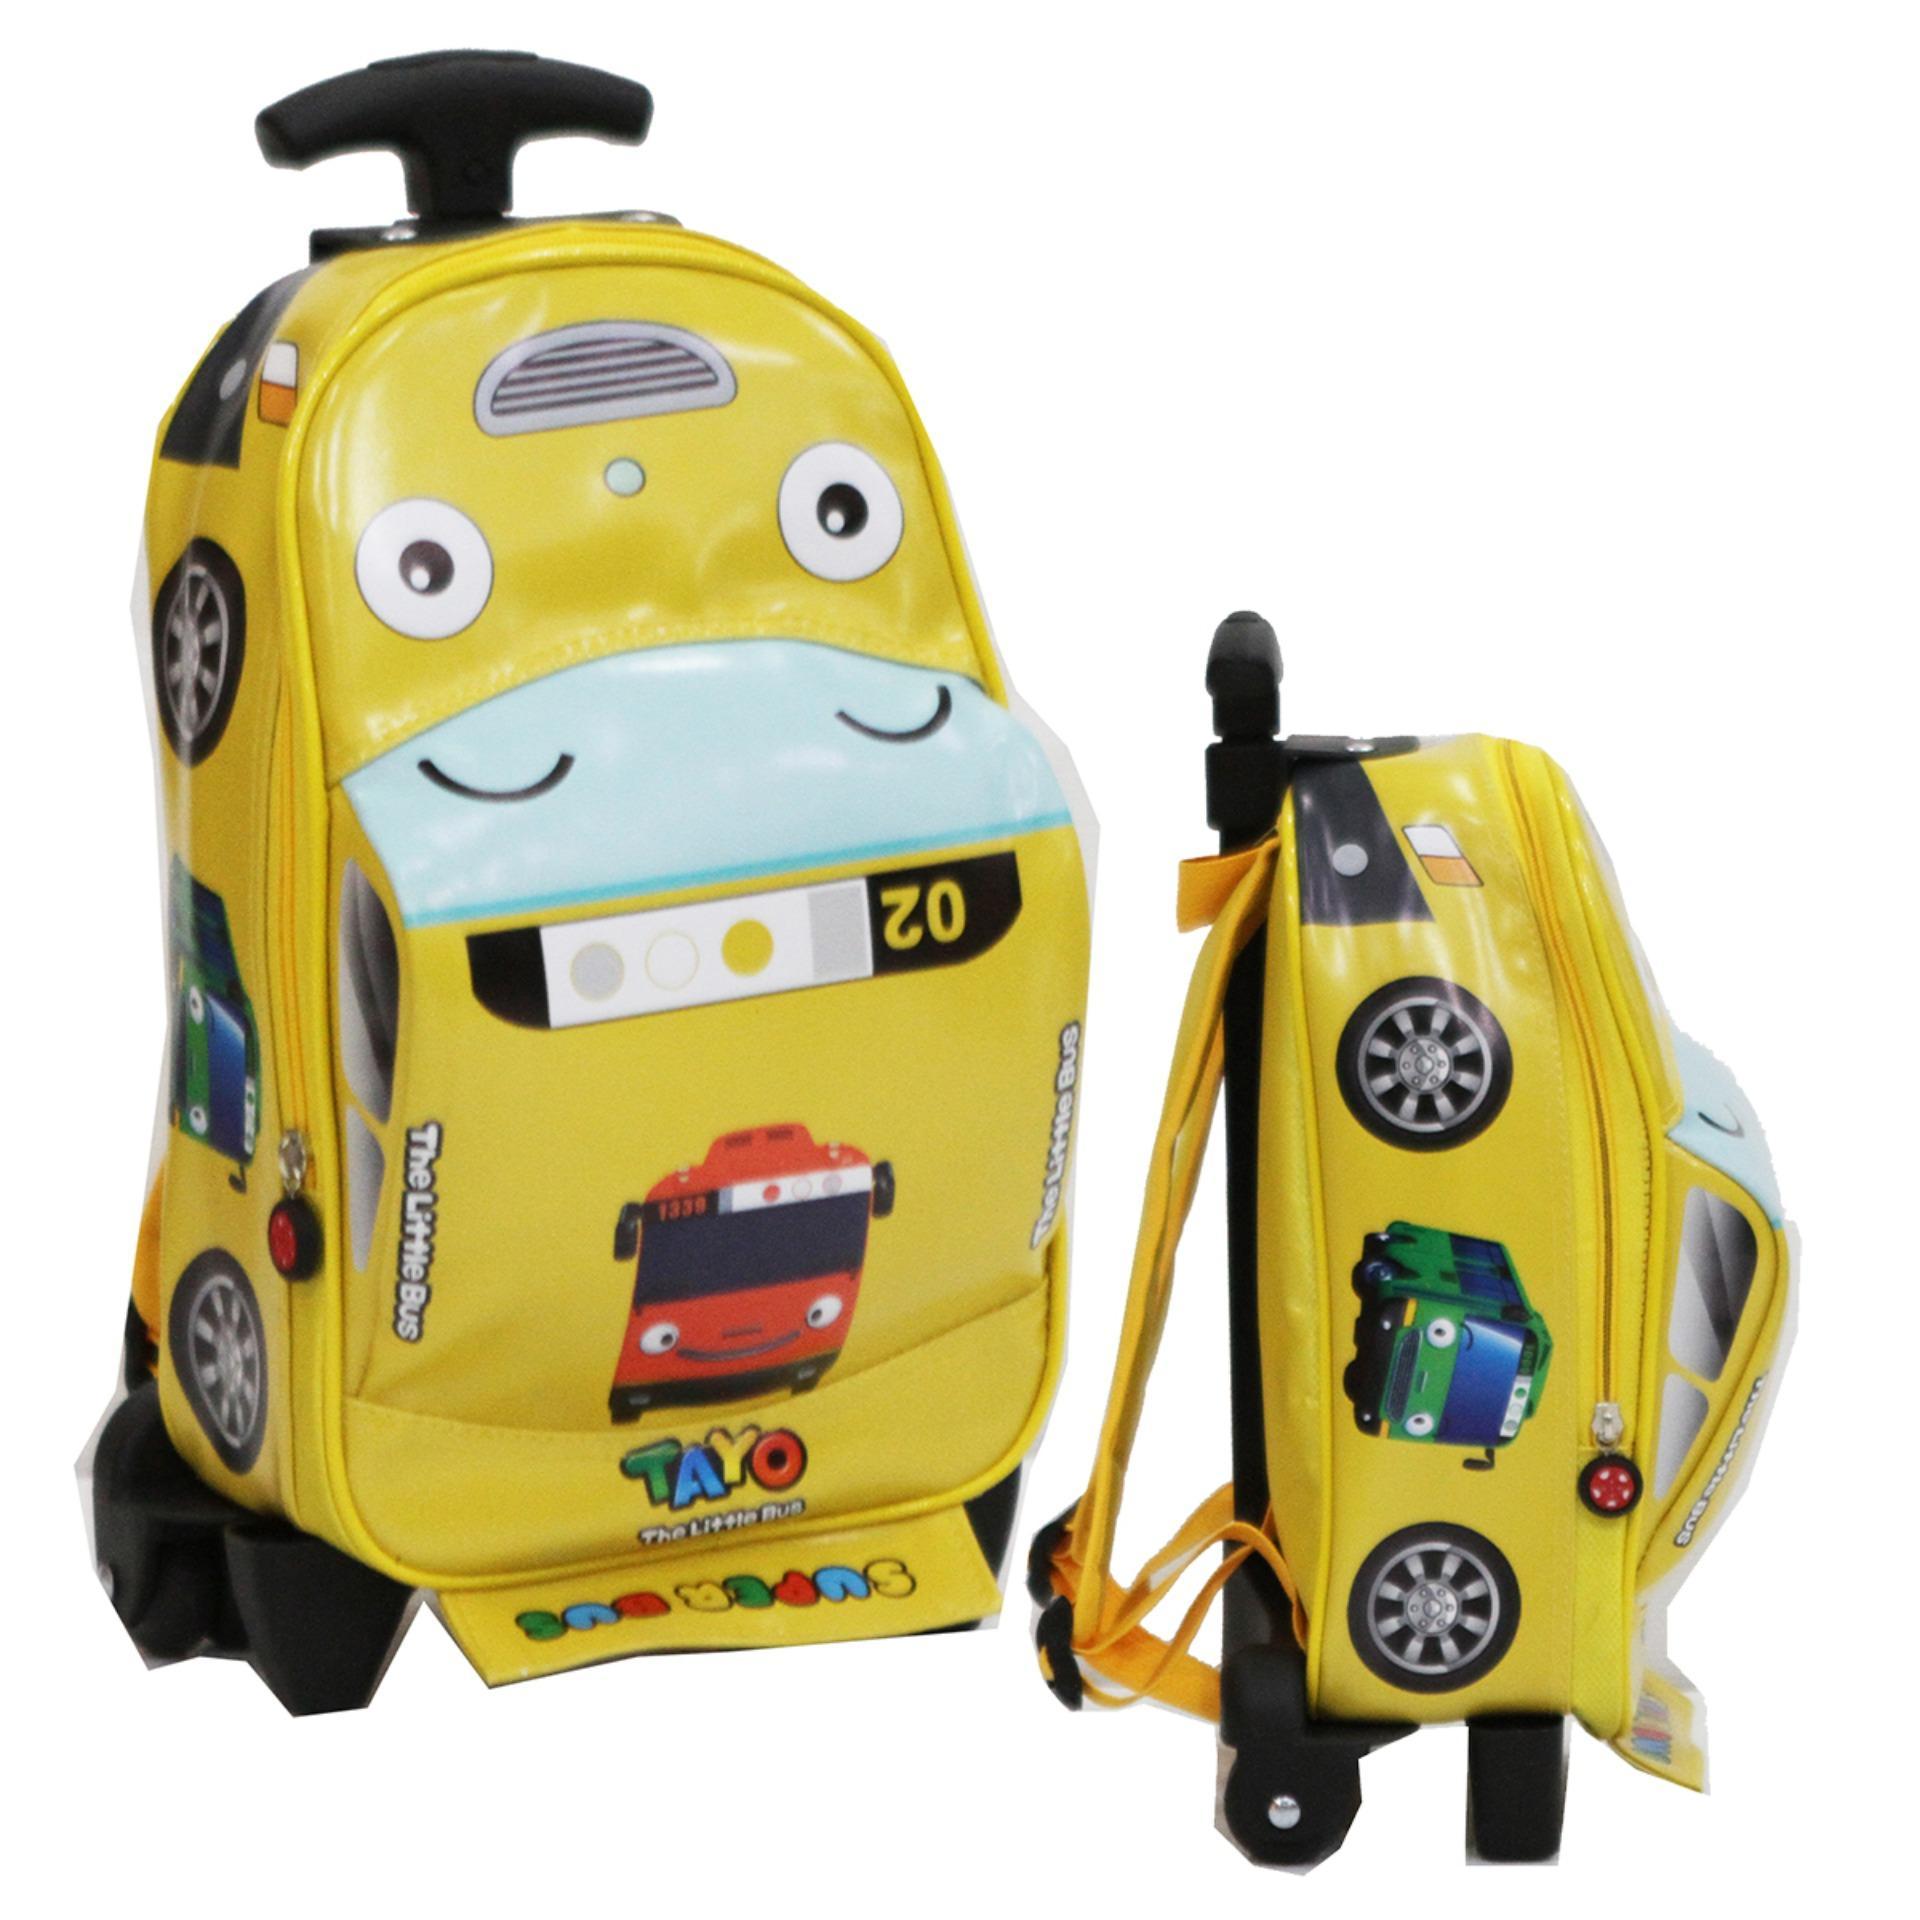 Diskon Tas Ransel Sekolah Anak Tk Sd Model 3 Dimensi Motif I Trolley Transformers Onlan Paut Gambar Tayo Bentuk Mobil Bahan Kain Sponge Anti Air